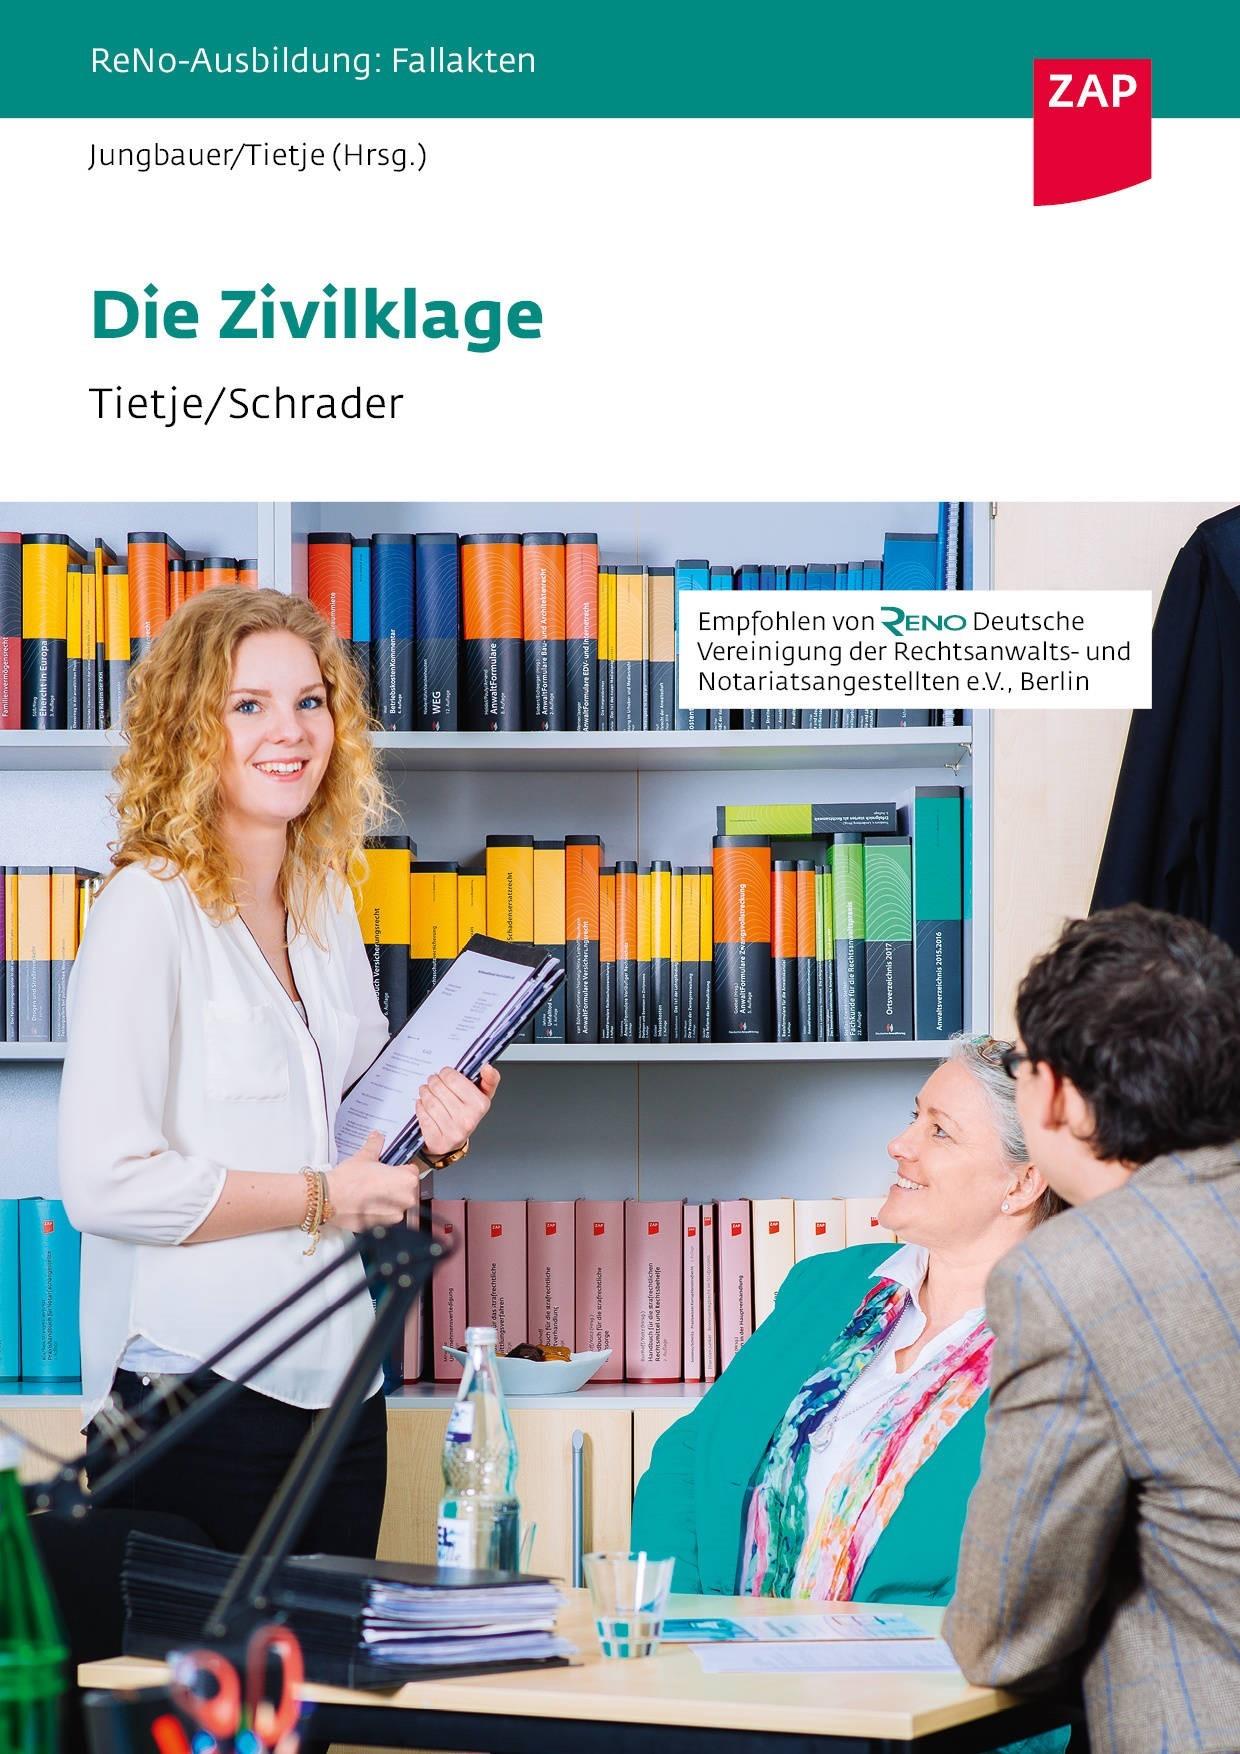 Die Zivilklage | Jungbauer / Tietje (Hrsg.), 2017 | Buch (Cover)